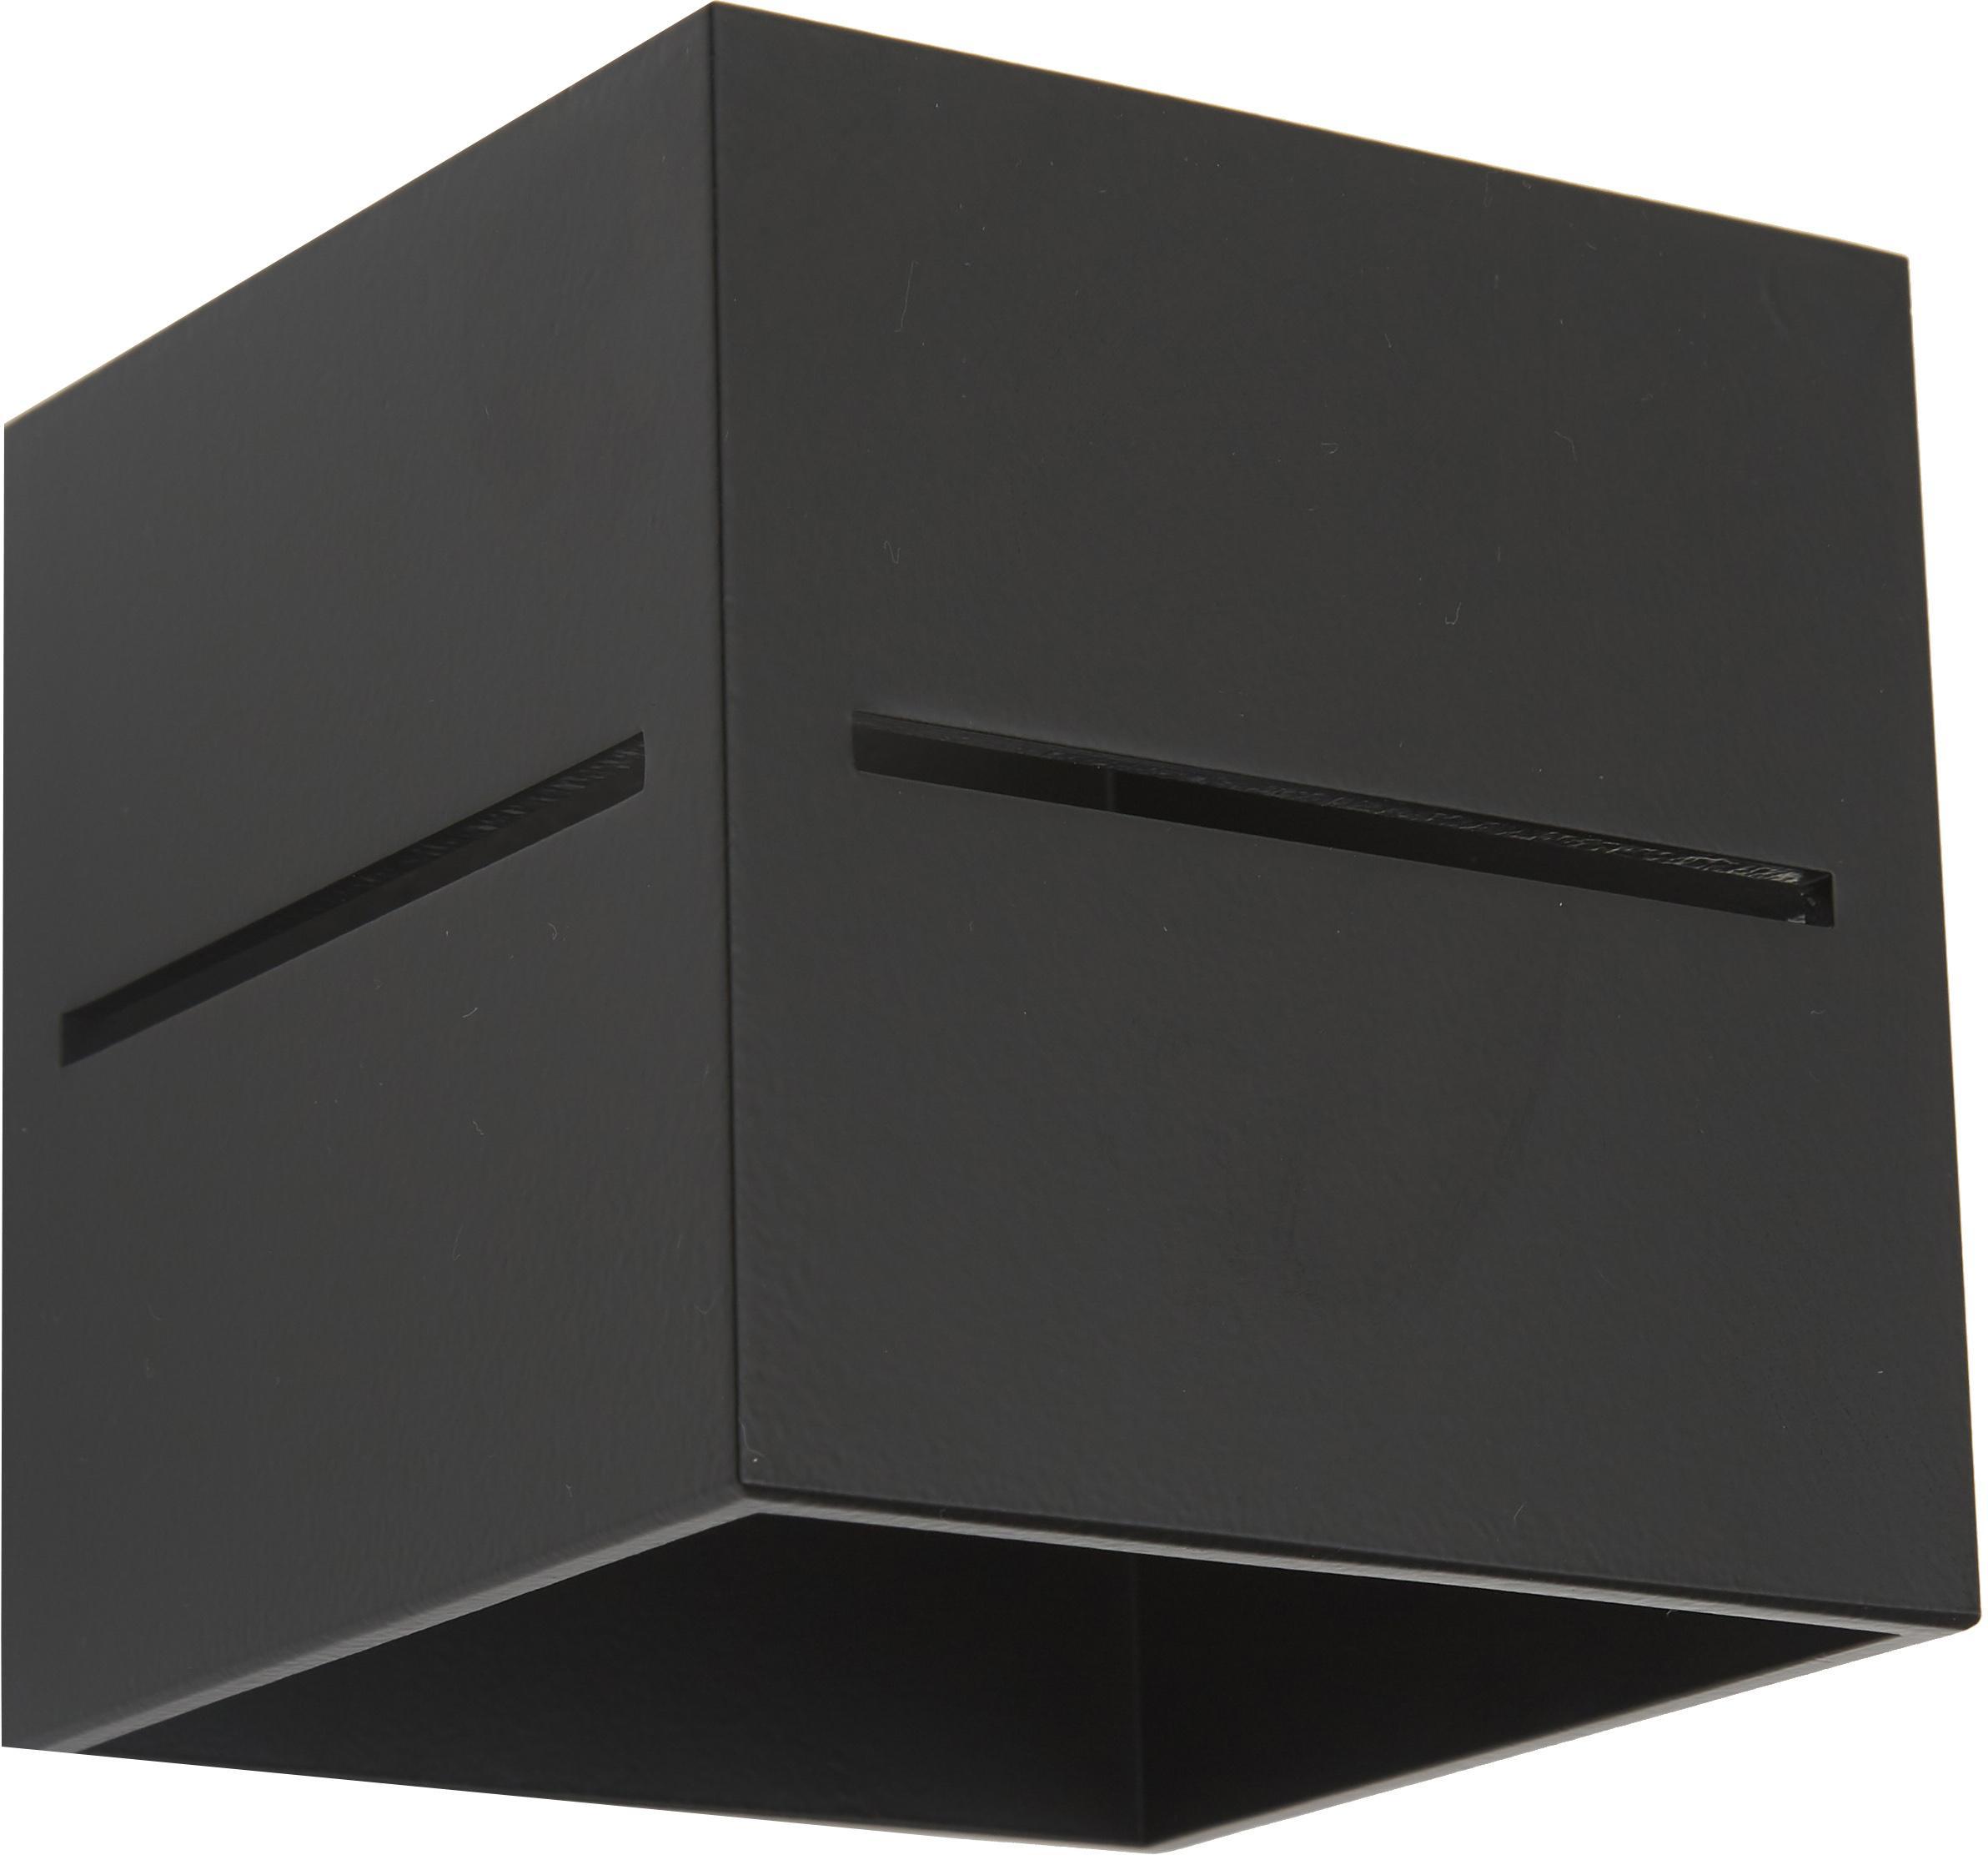 Kinkiet Lorum, Aluminium, Czarny, S 10 x W 10 cm